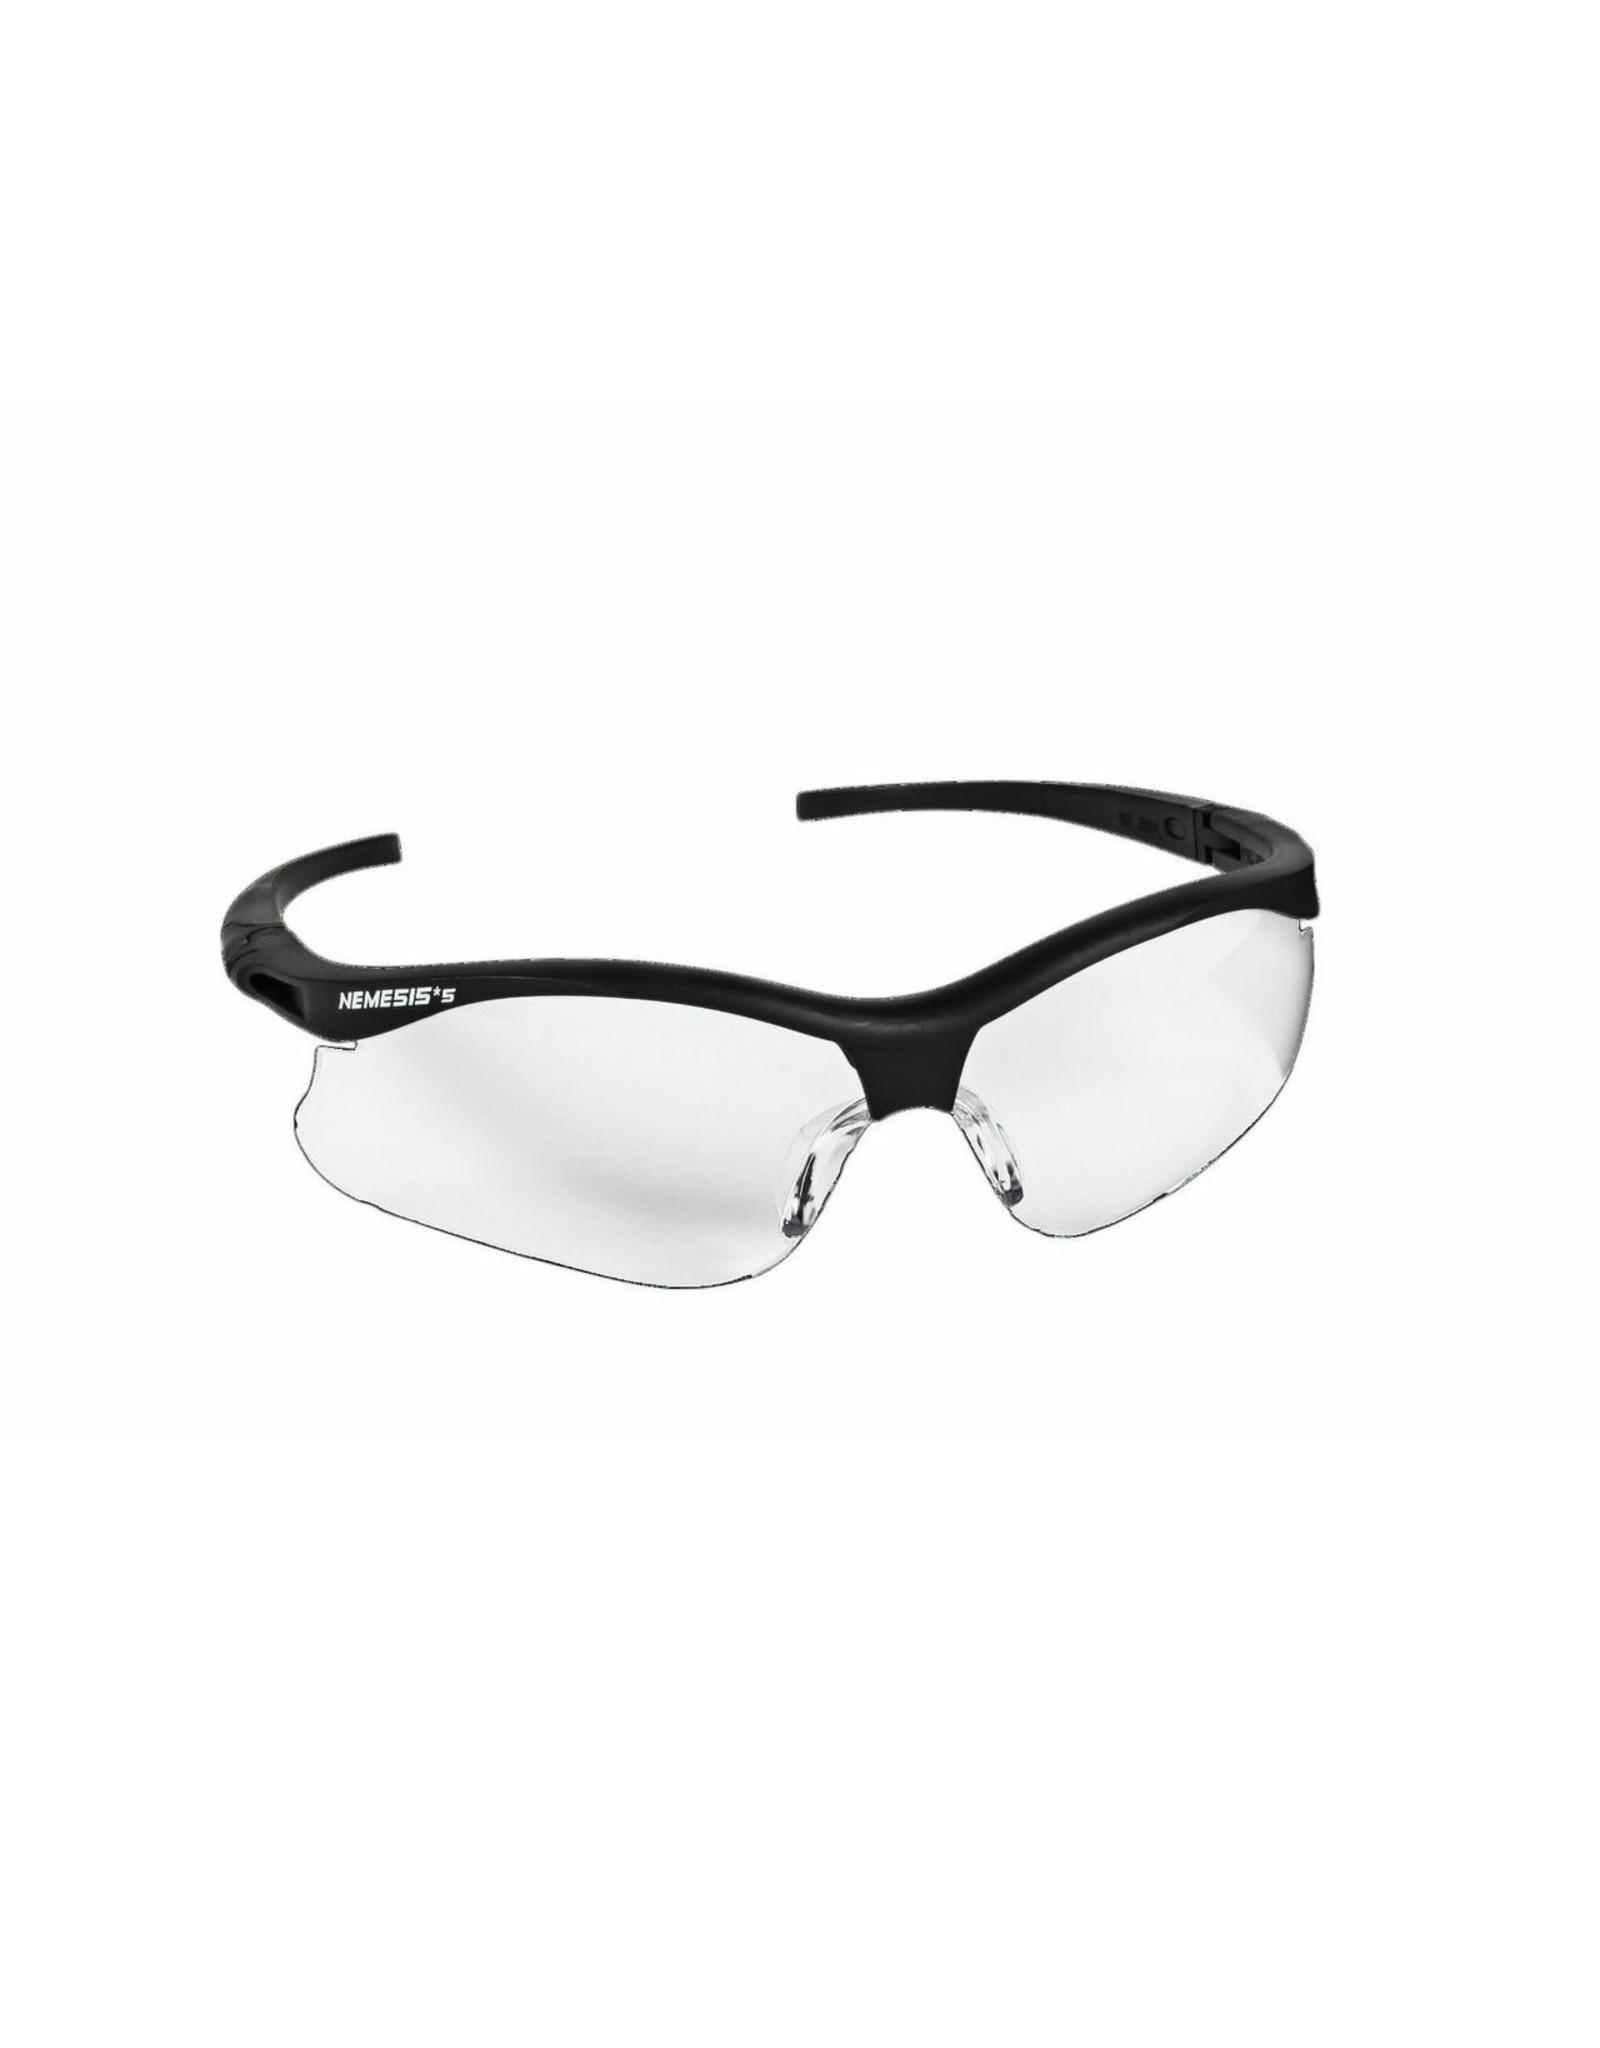 Jackson Safety Jackson Safety V30 NEMESIS Safety Glasses